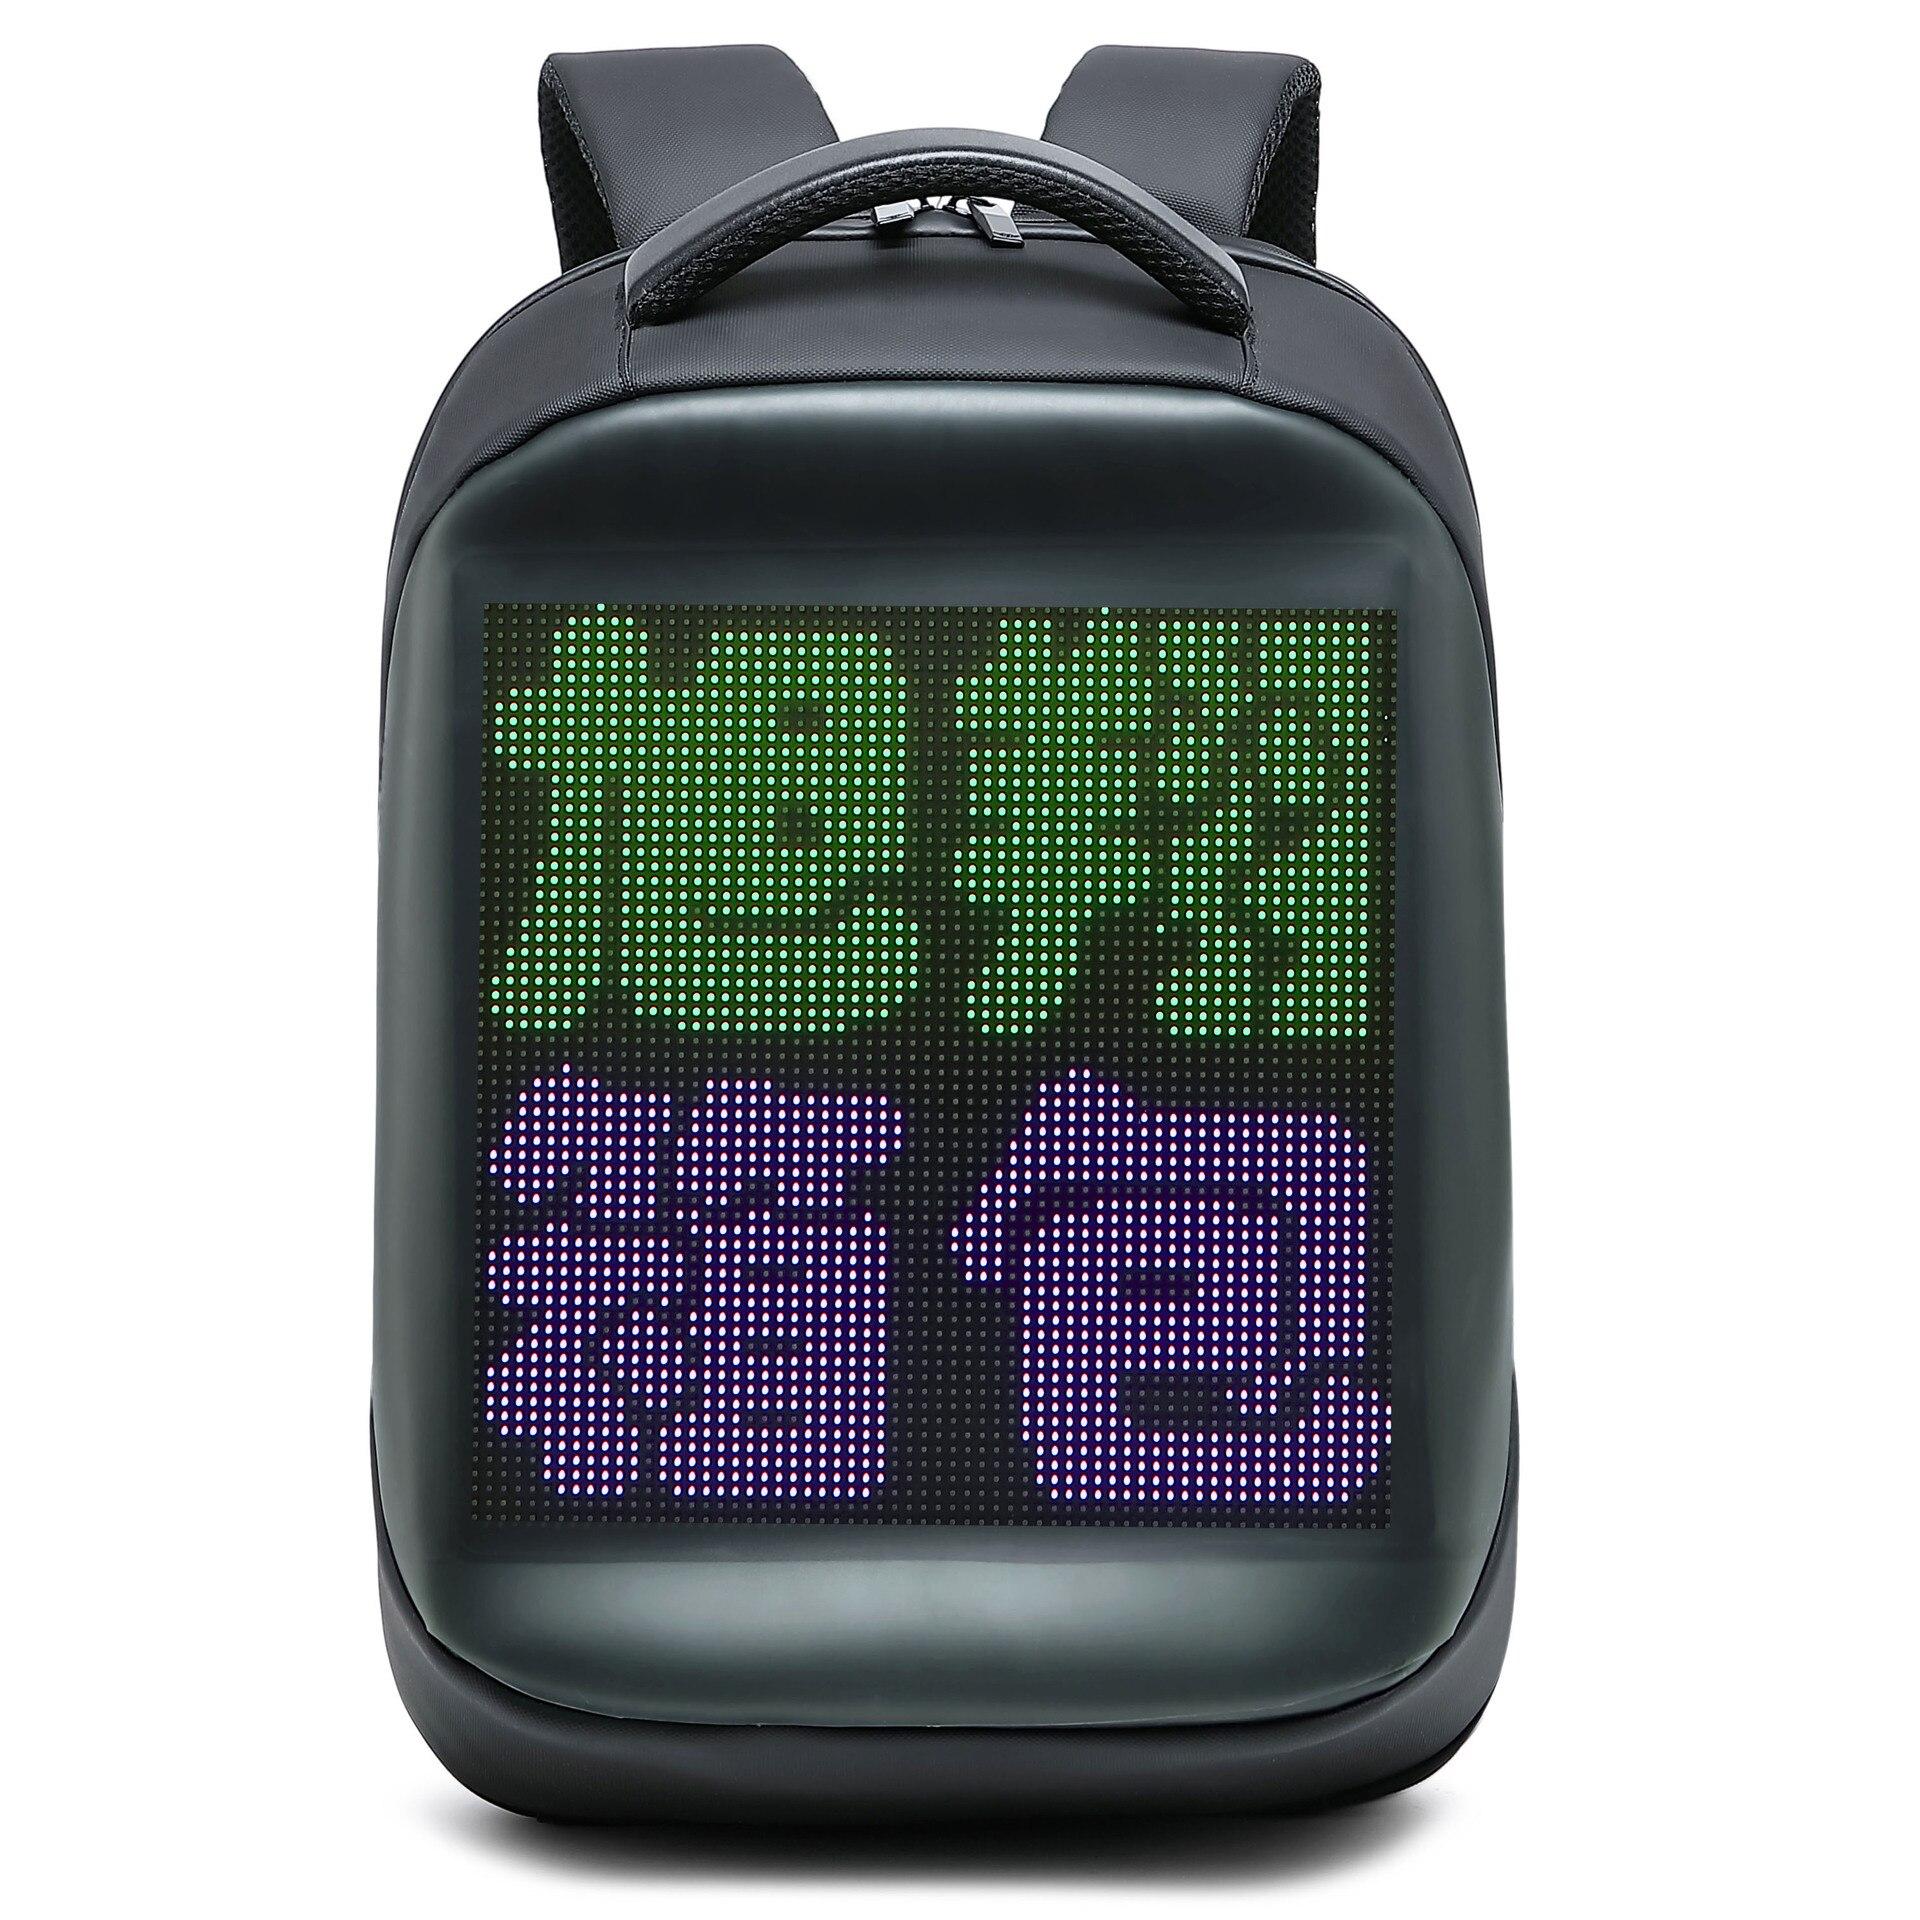 LED Advertising Backpack WIFI Version Portable LED Backpack Magic Smart Walking Billboard APP Control Outdoor Led Display Bag,